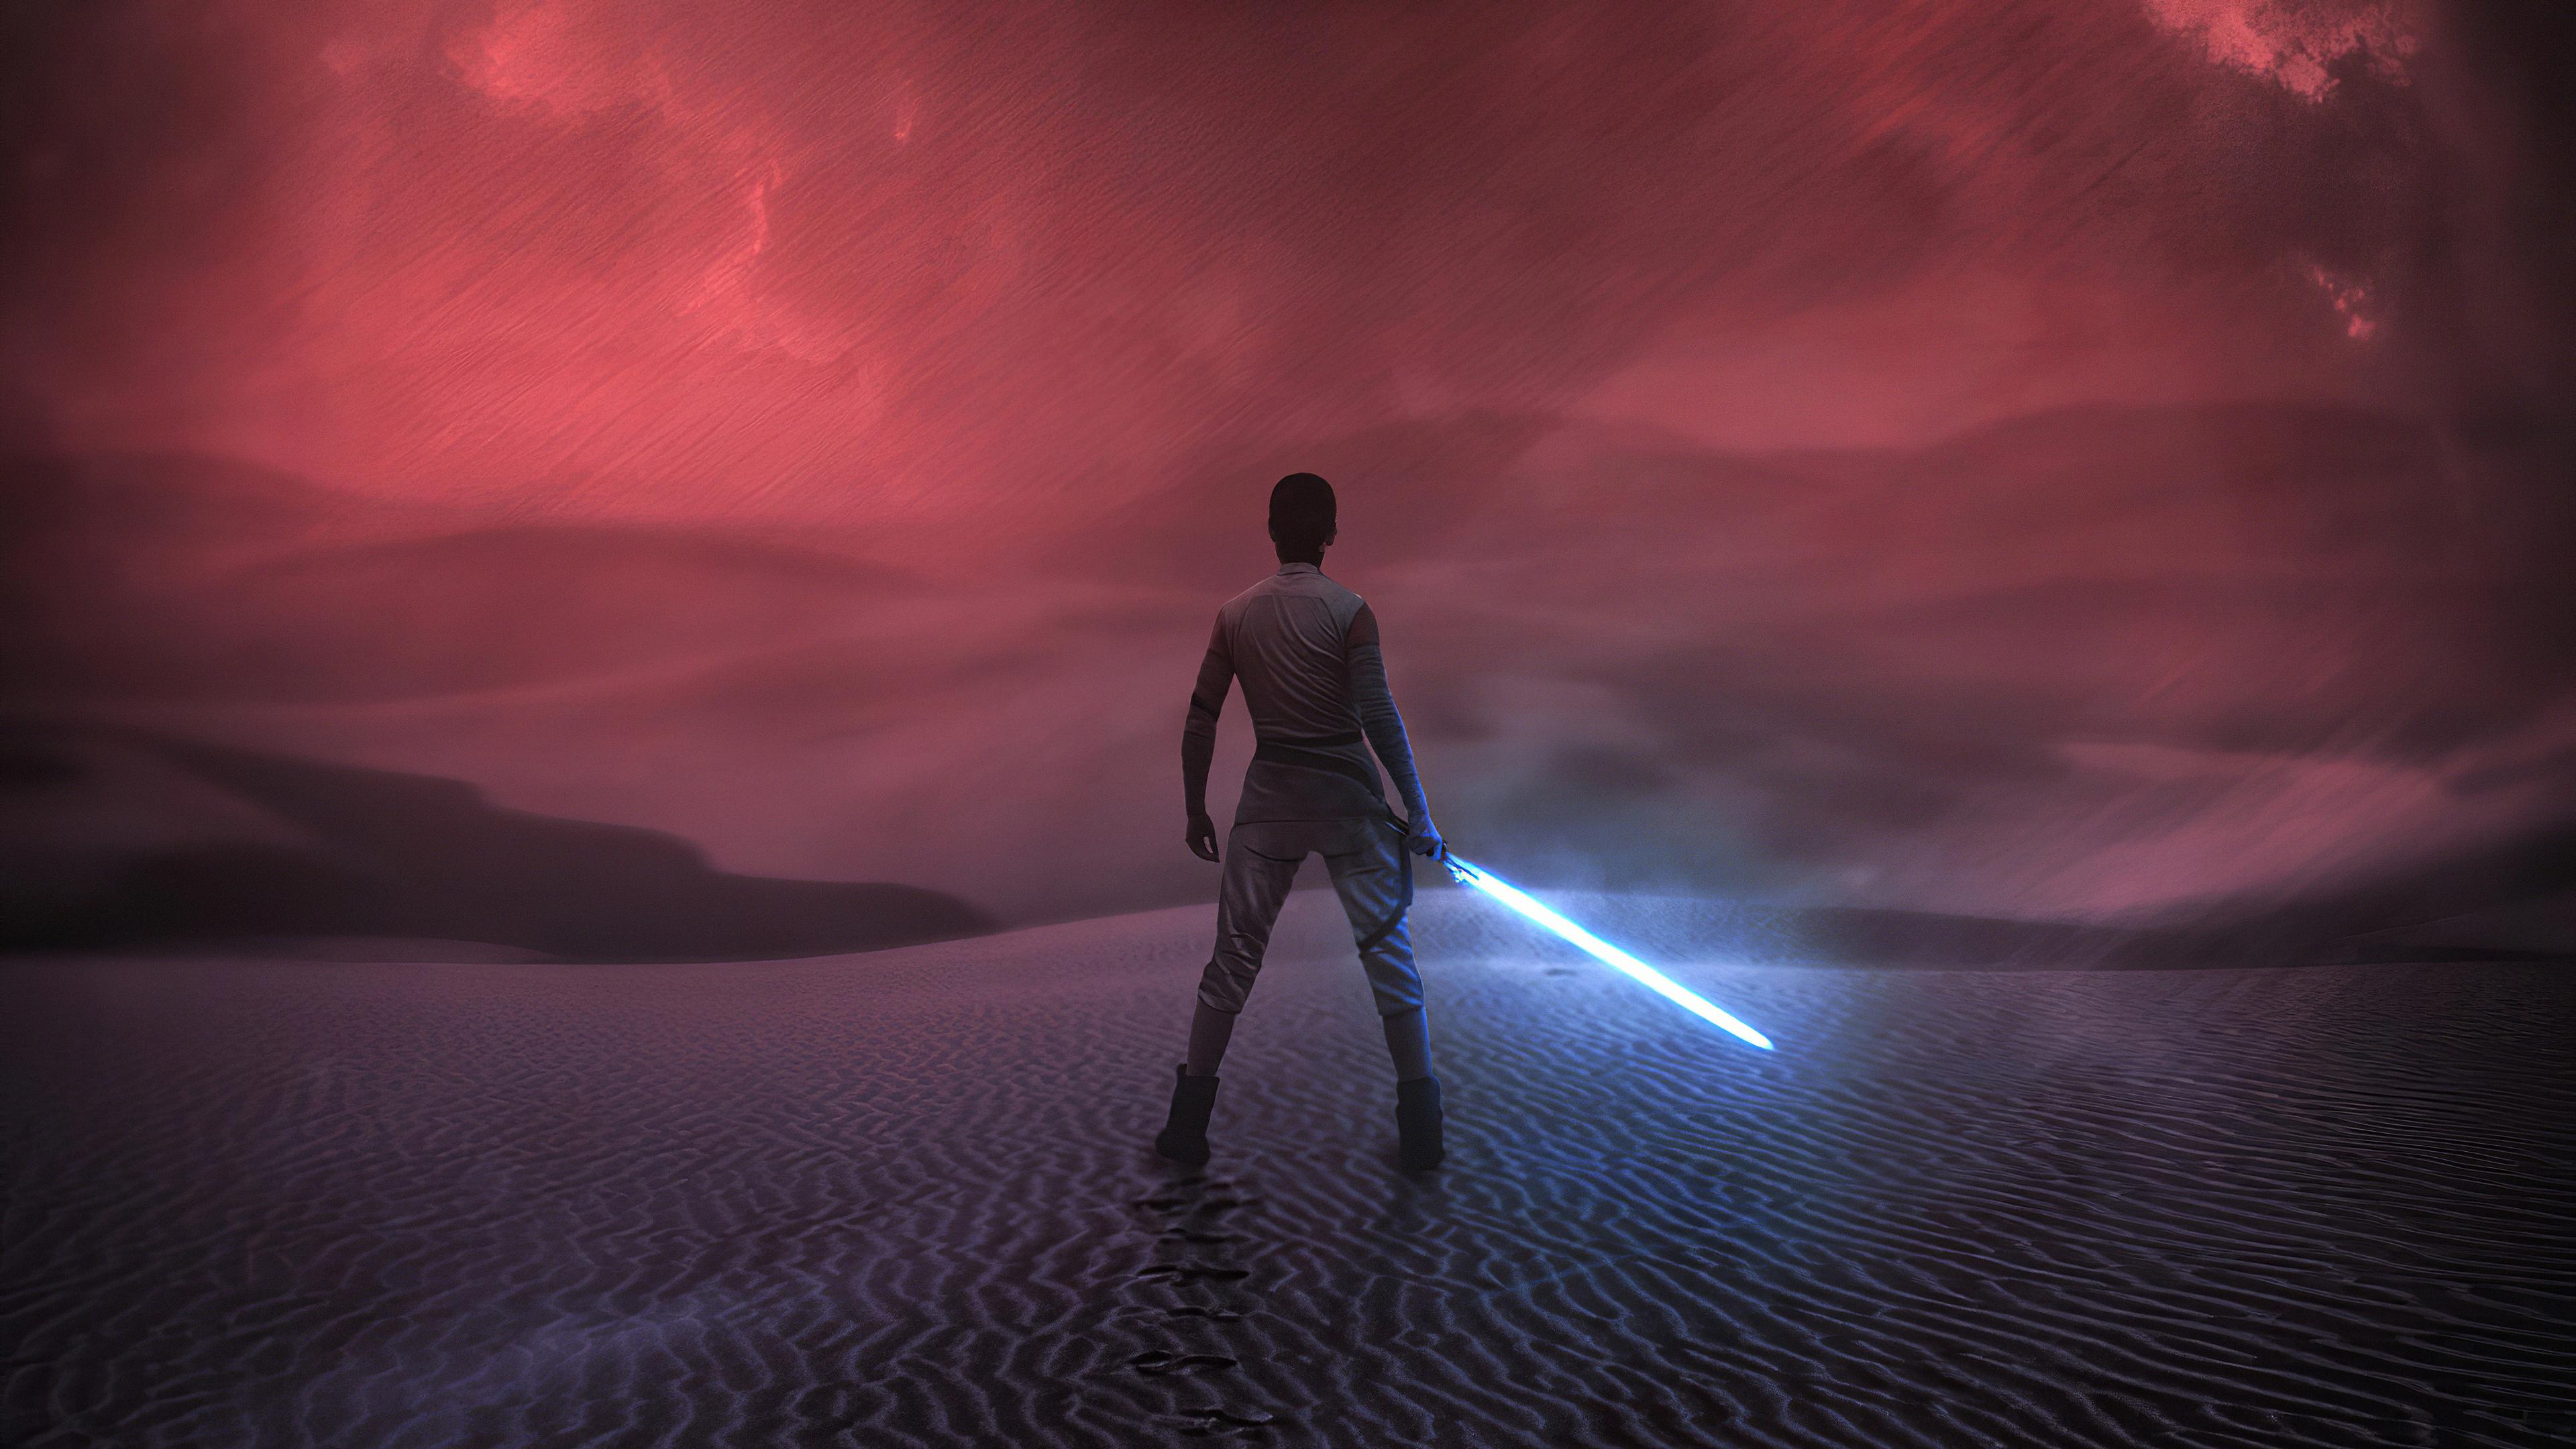 Wallpaper 4k Star Wars The Rise Of Skywalker Rey